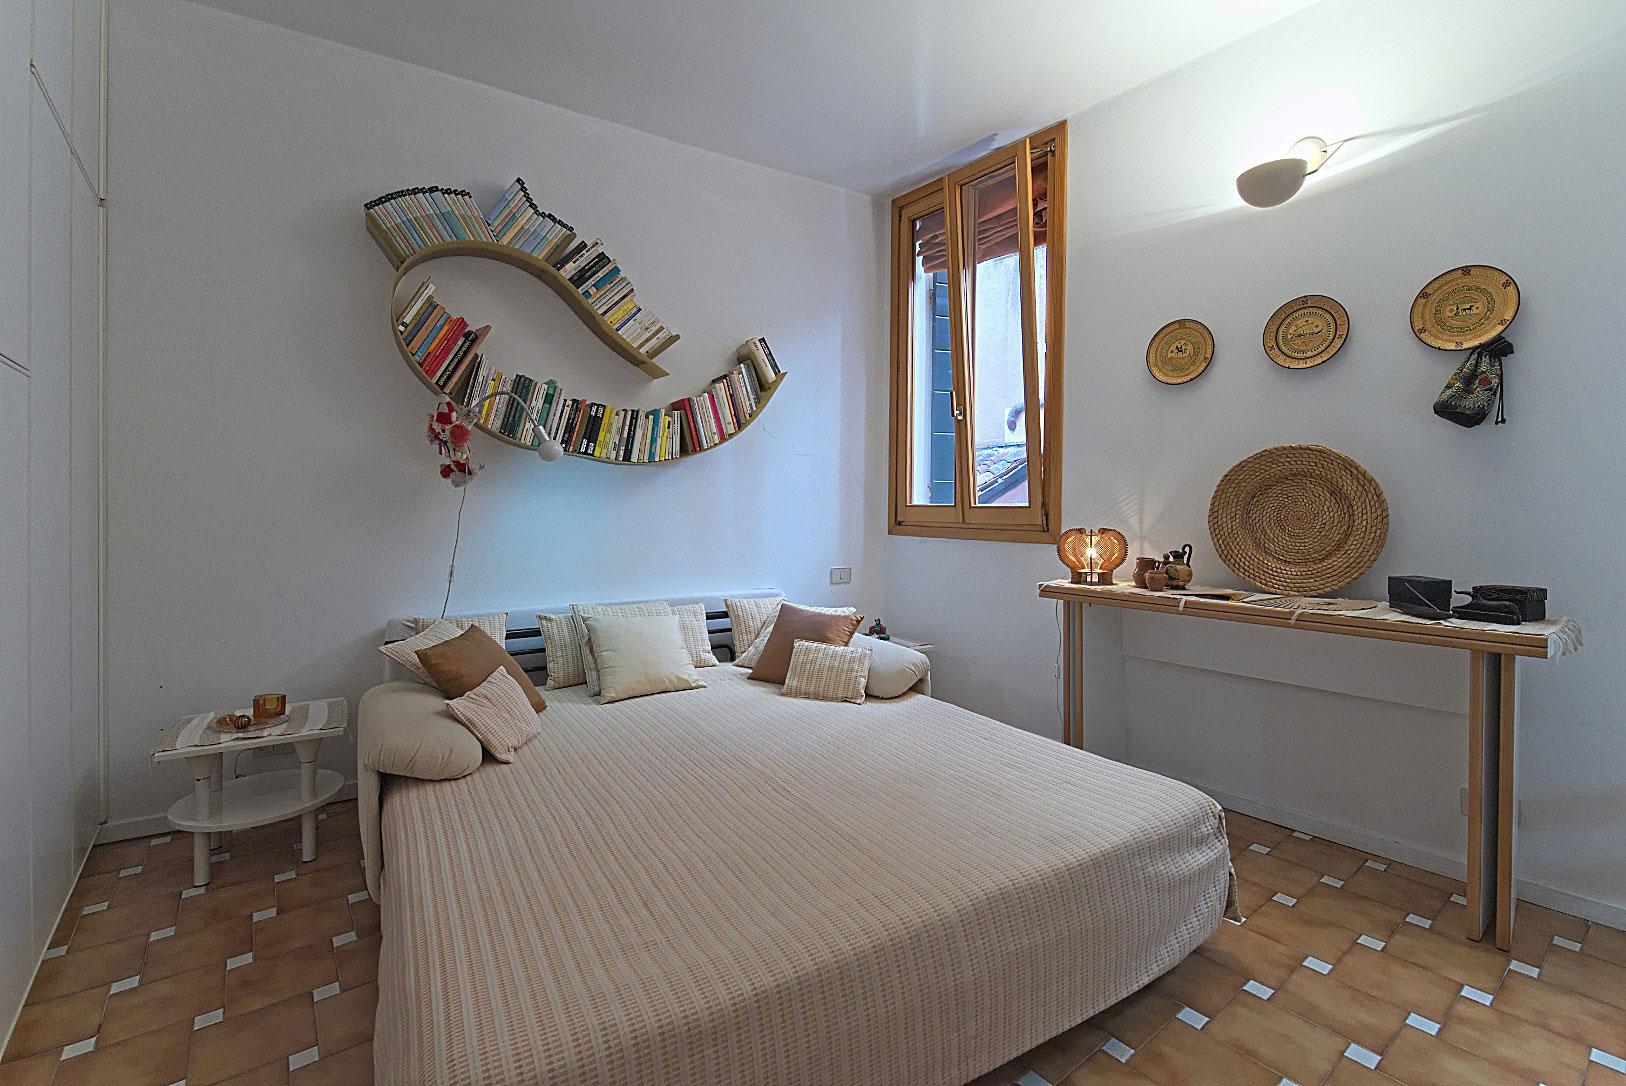 Casa Marina in Venice - Holiday Apartment | Passepartout Group